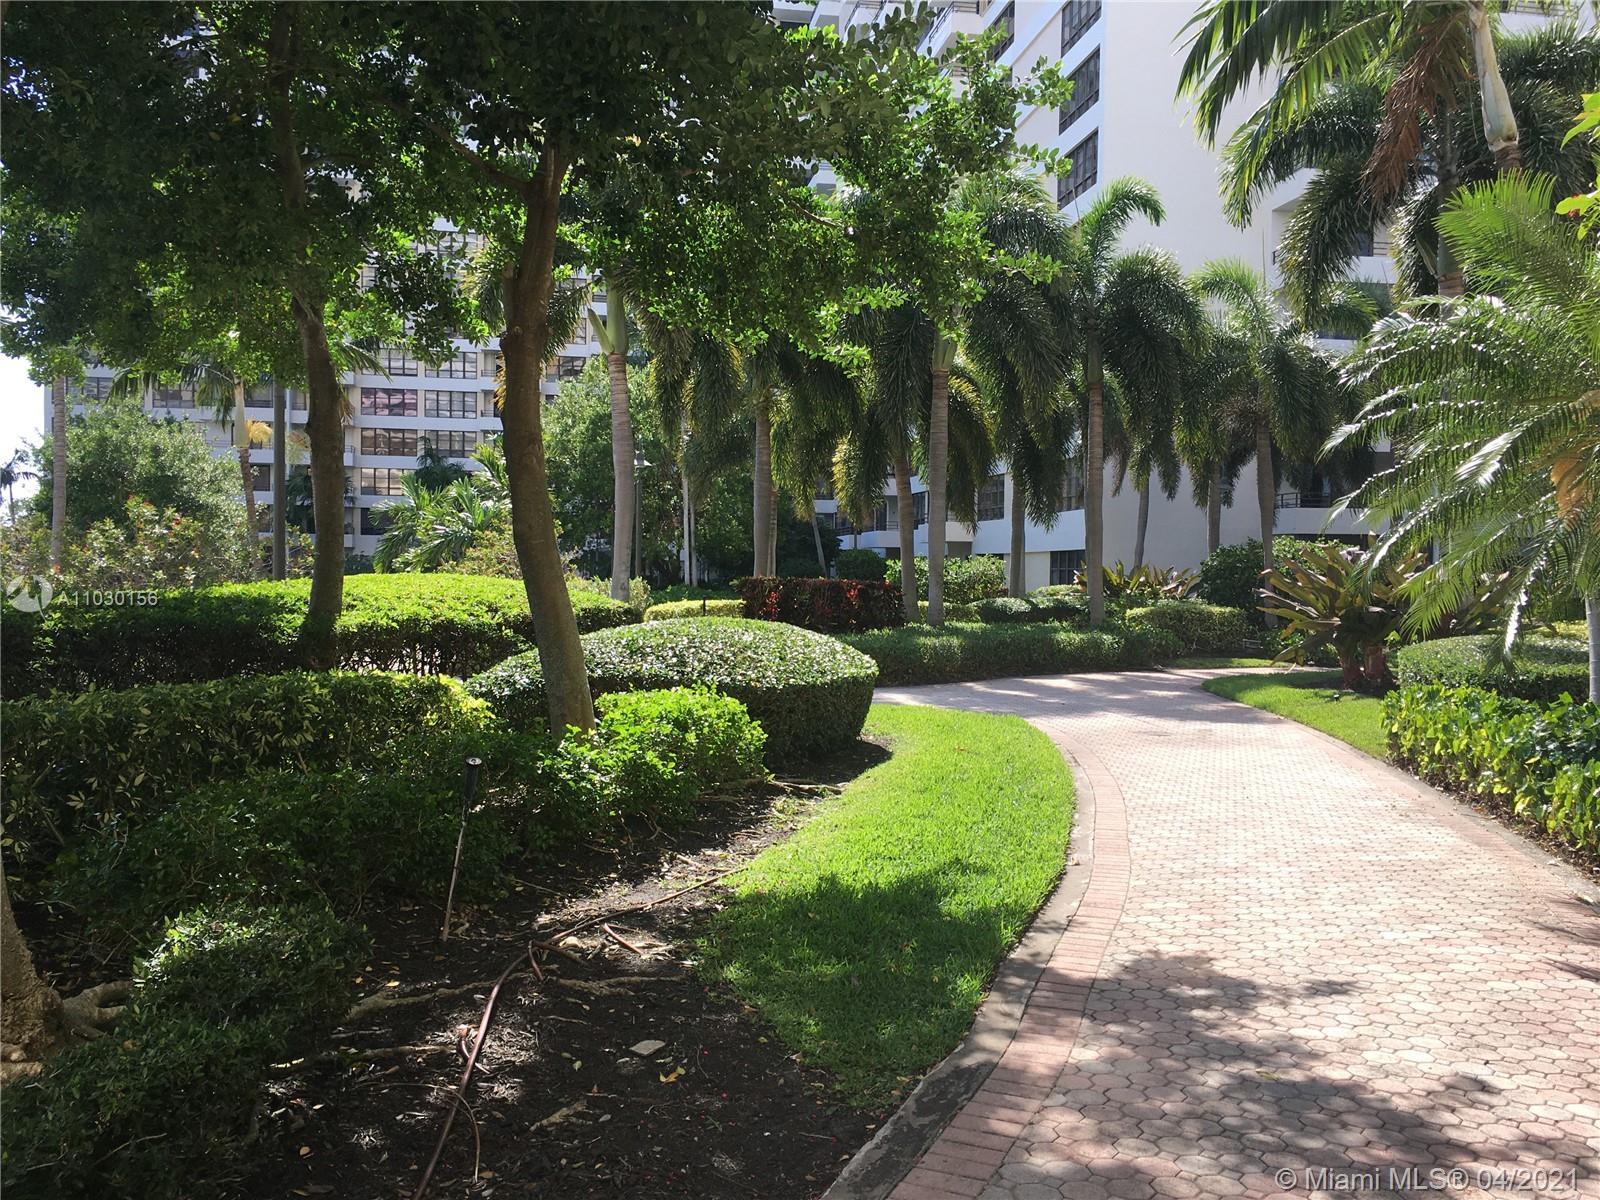 Photo of 2500 Parkview Dr #1108, Hallandale Beach, Florida, 33009 - Gym